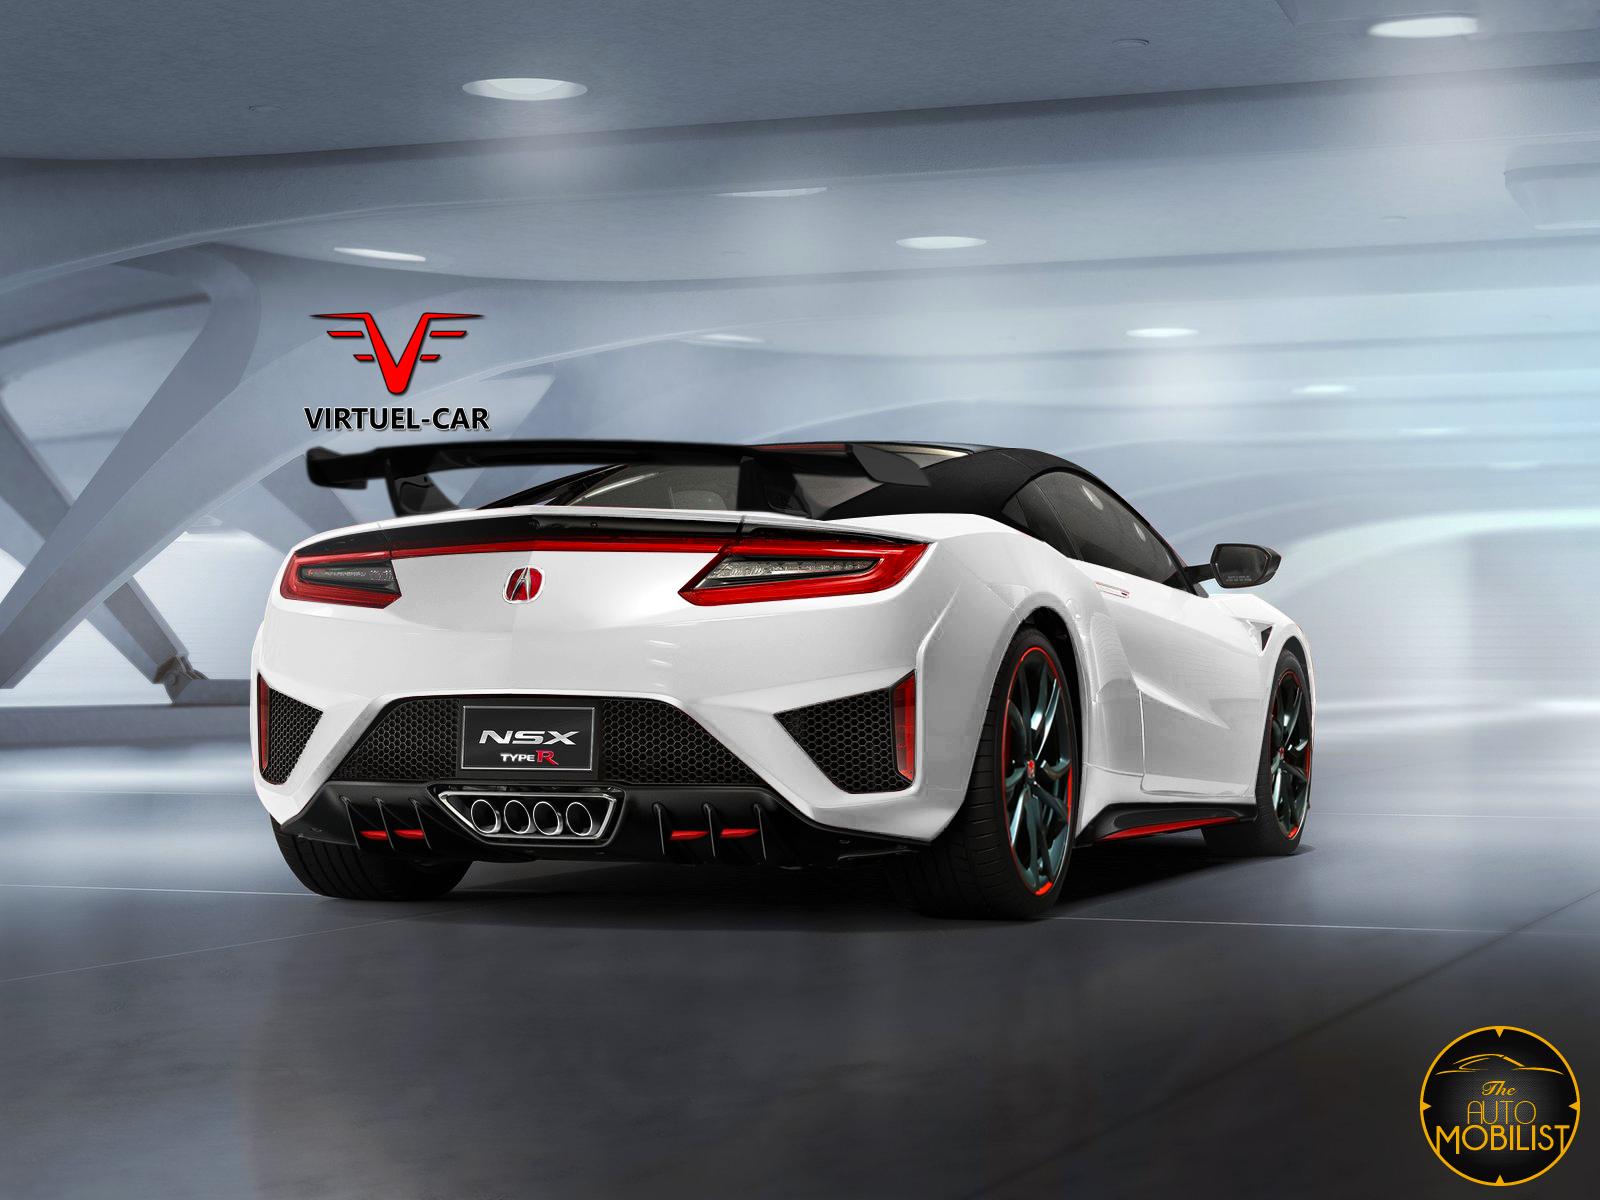 New-Acura-Honda-NSX-Type-R-2